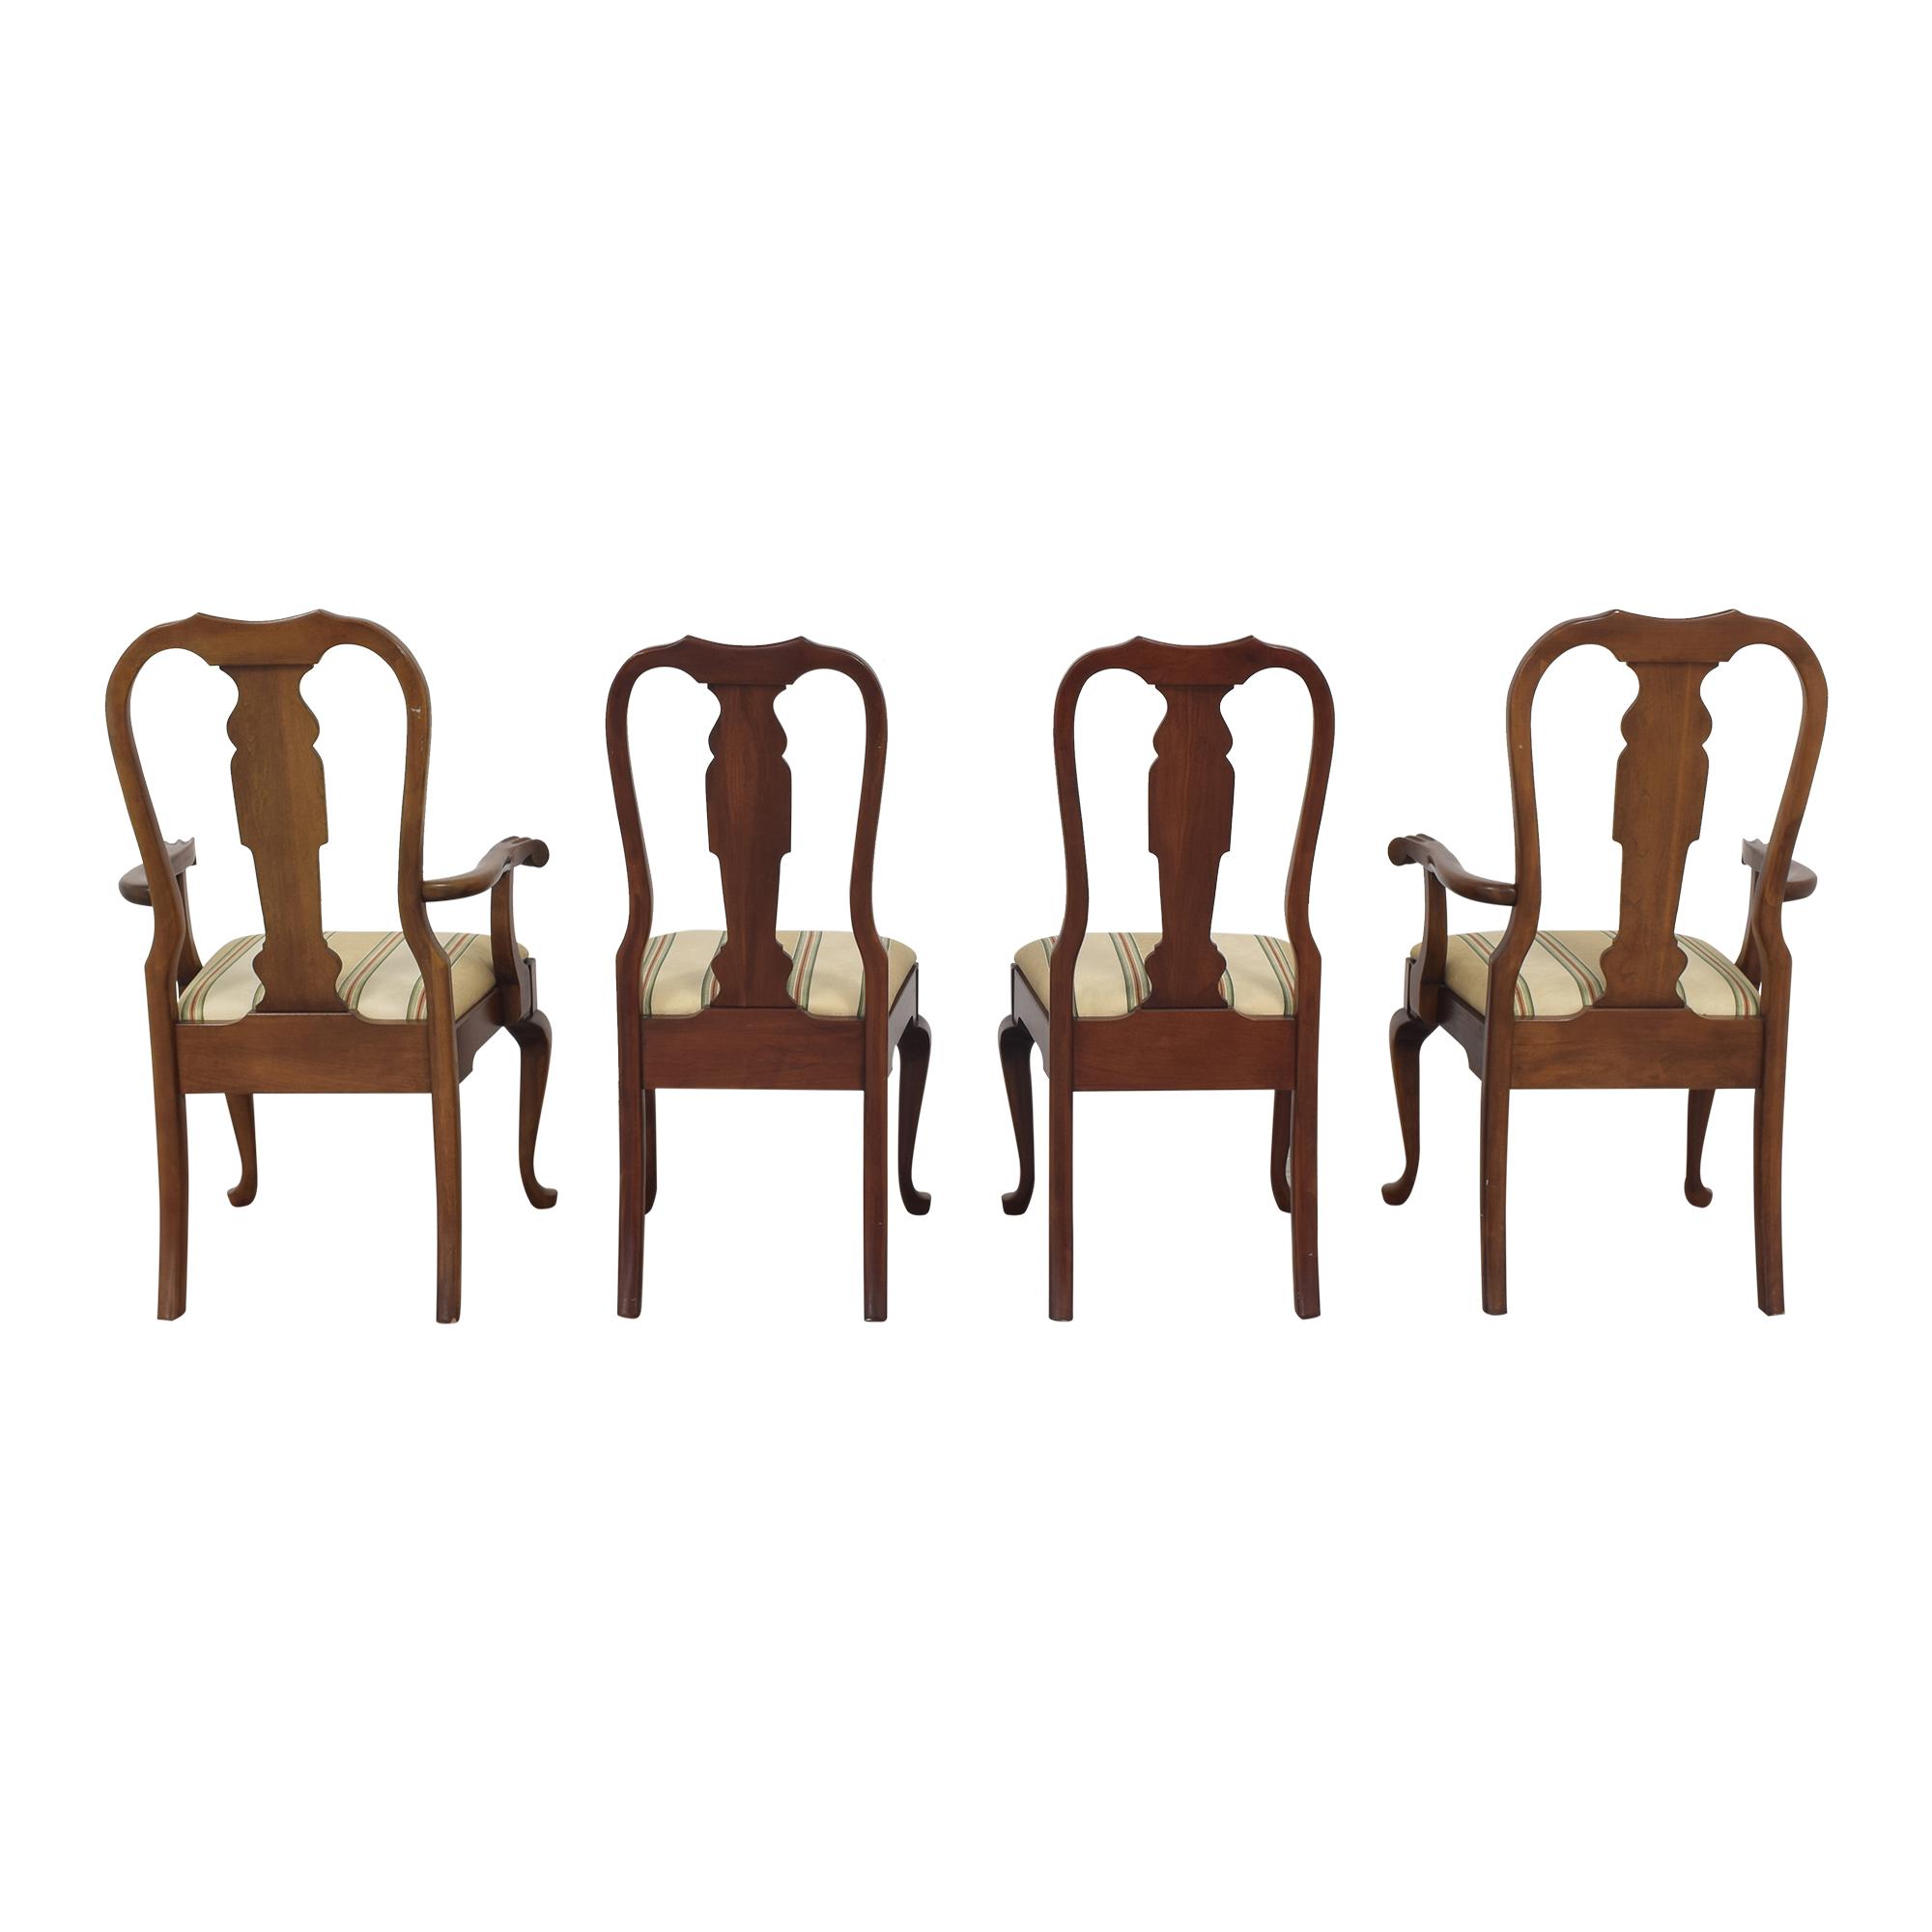 Pennsylvania House Pennsylvania House Stripe Dining Chairs ma